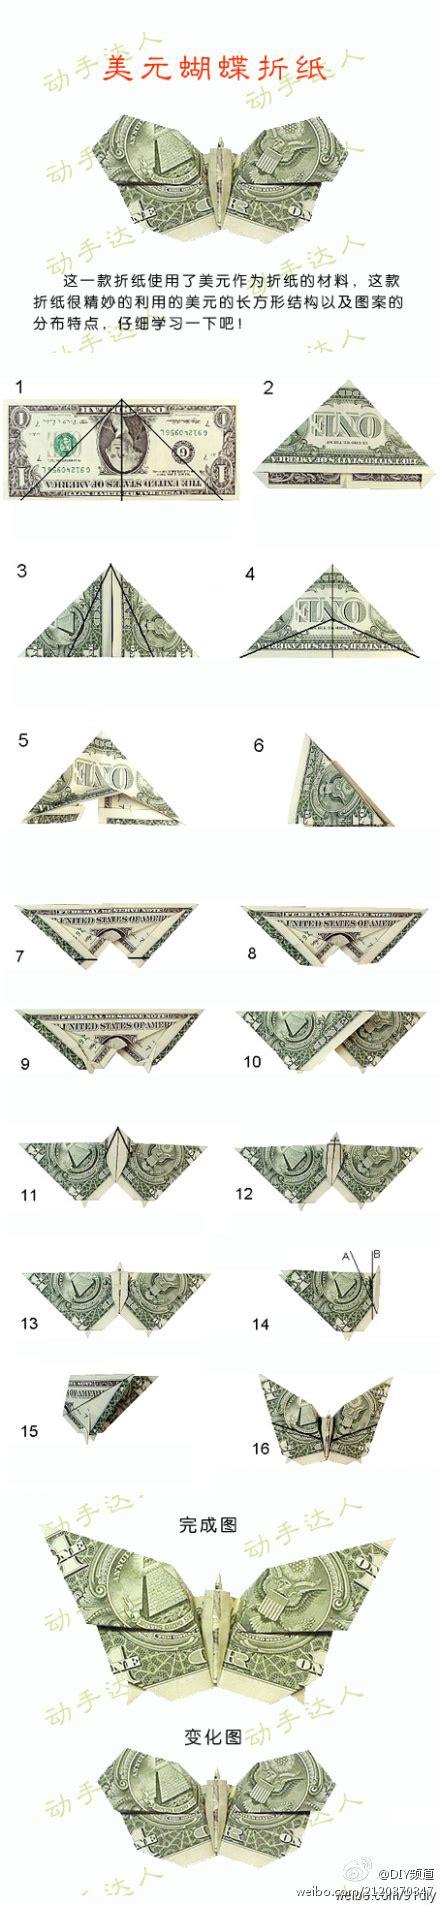 Origami Money Butterfly Folding - dollar bill origami butterfly astounding dollar